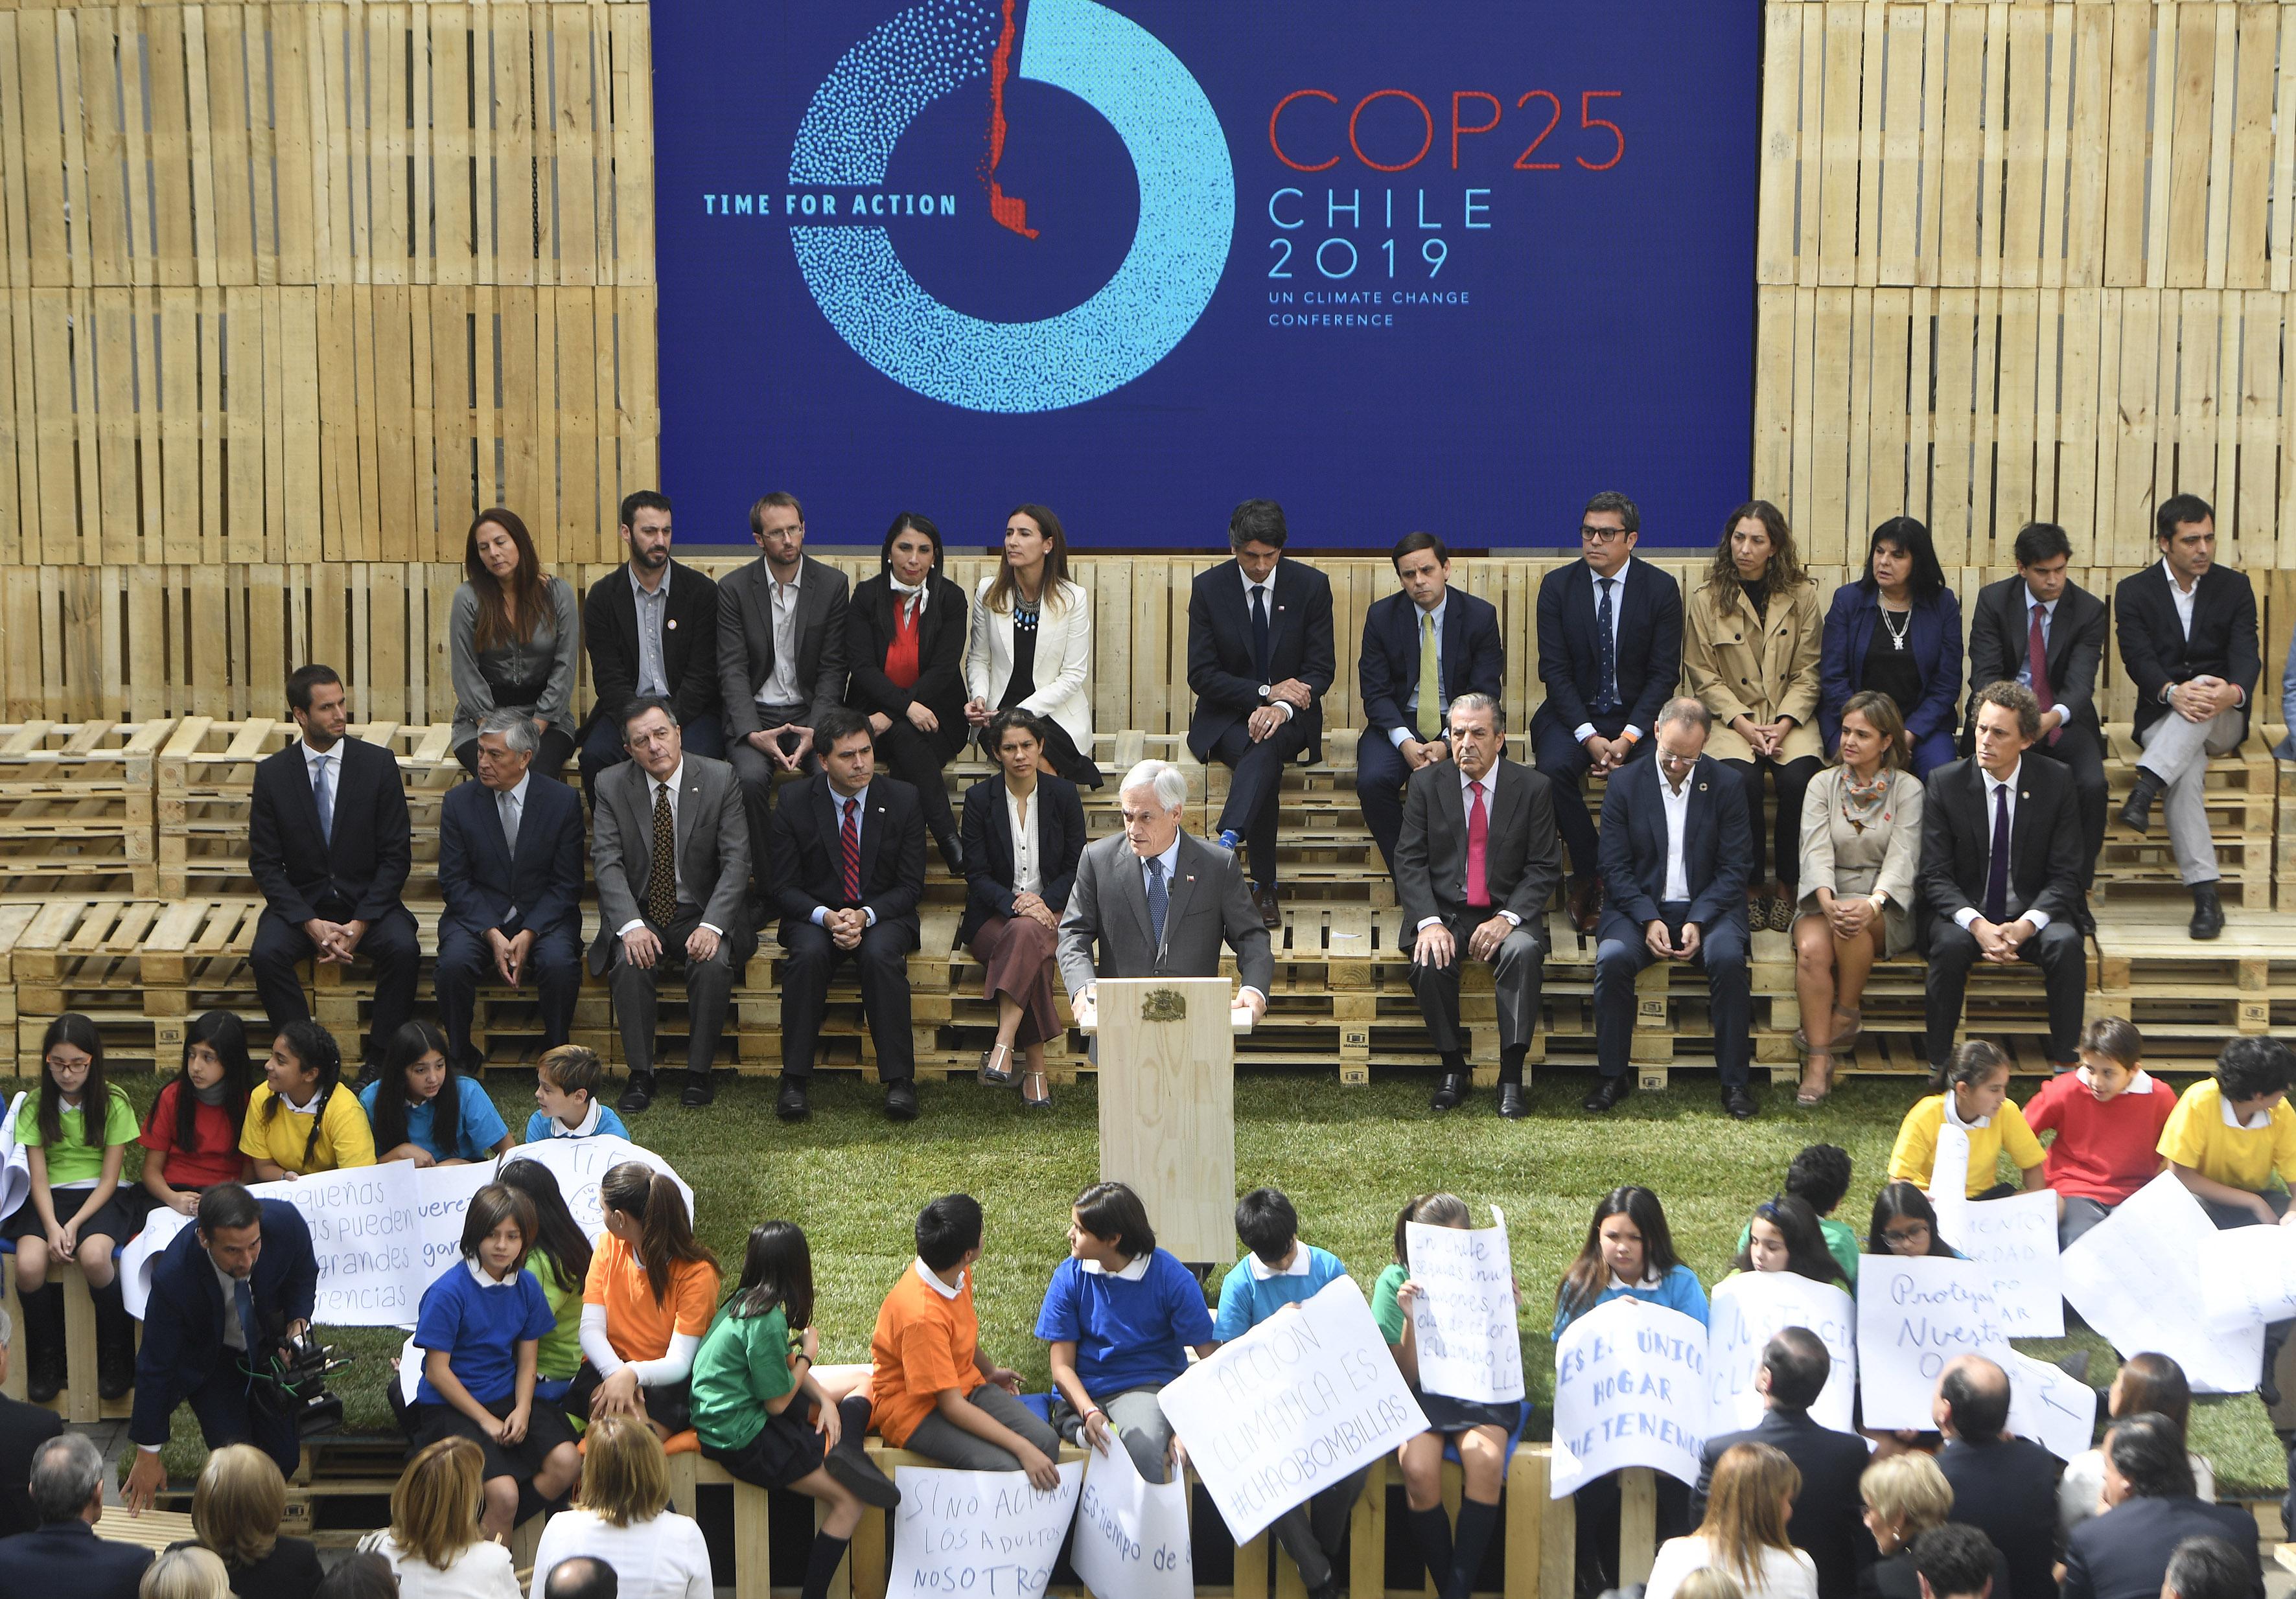 Presidente Sebastián Piñera y Ministra Carolina Schmidt lanzan cumbre de cambio climático COP25